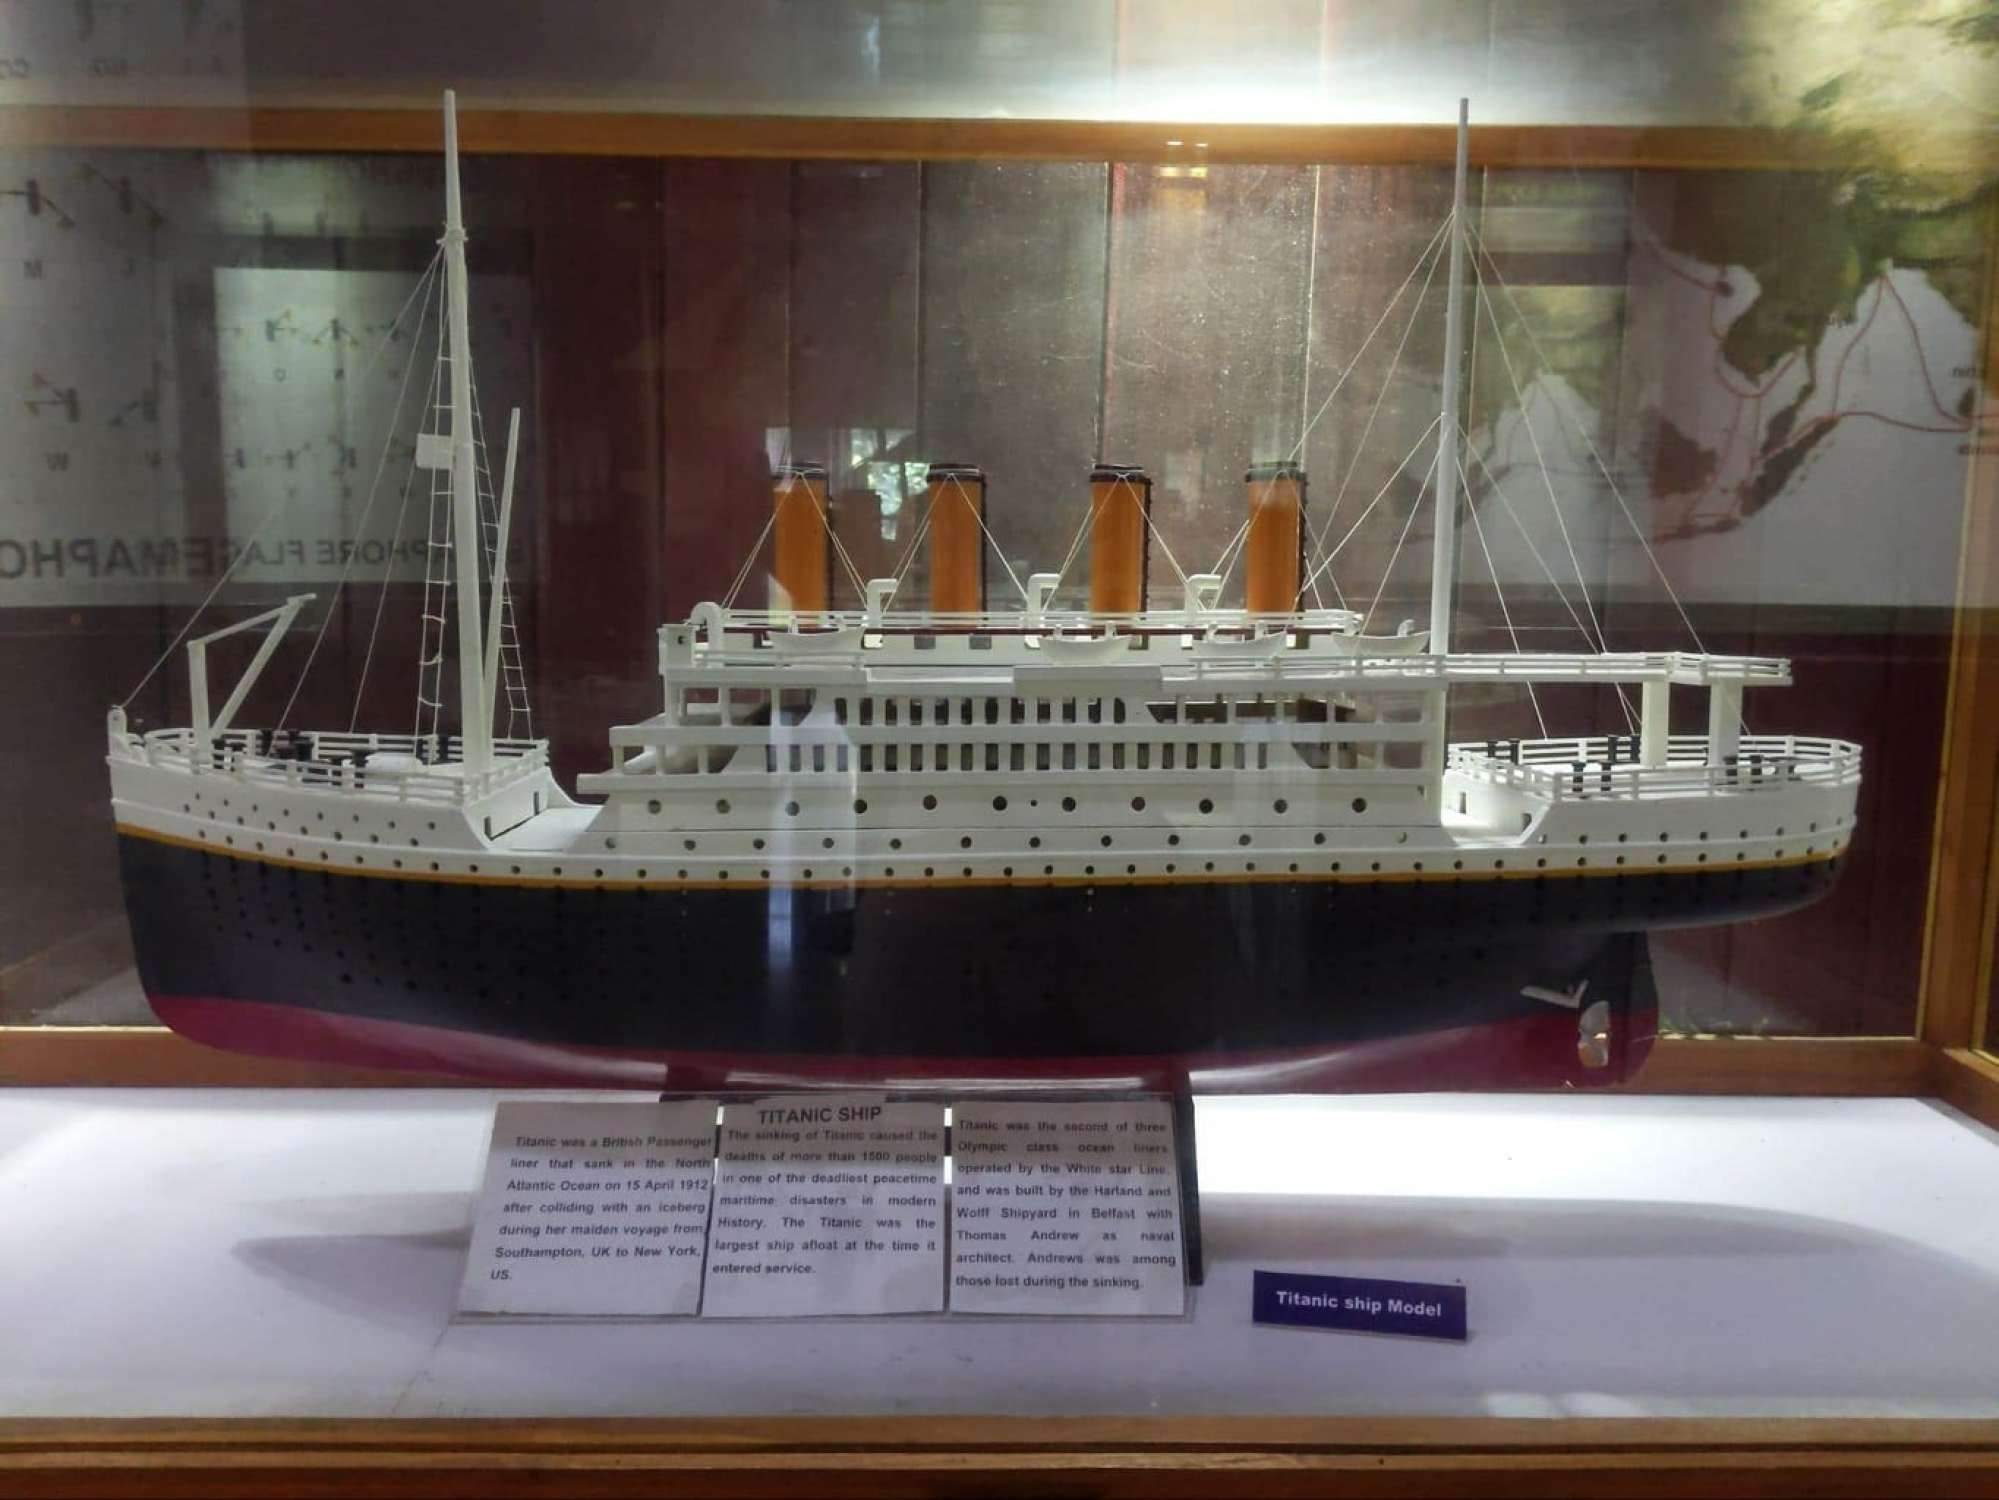 Heritage Maritime Museum model of the Titanic